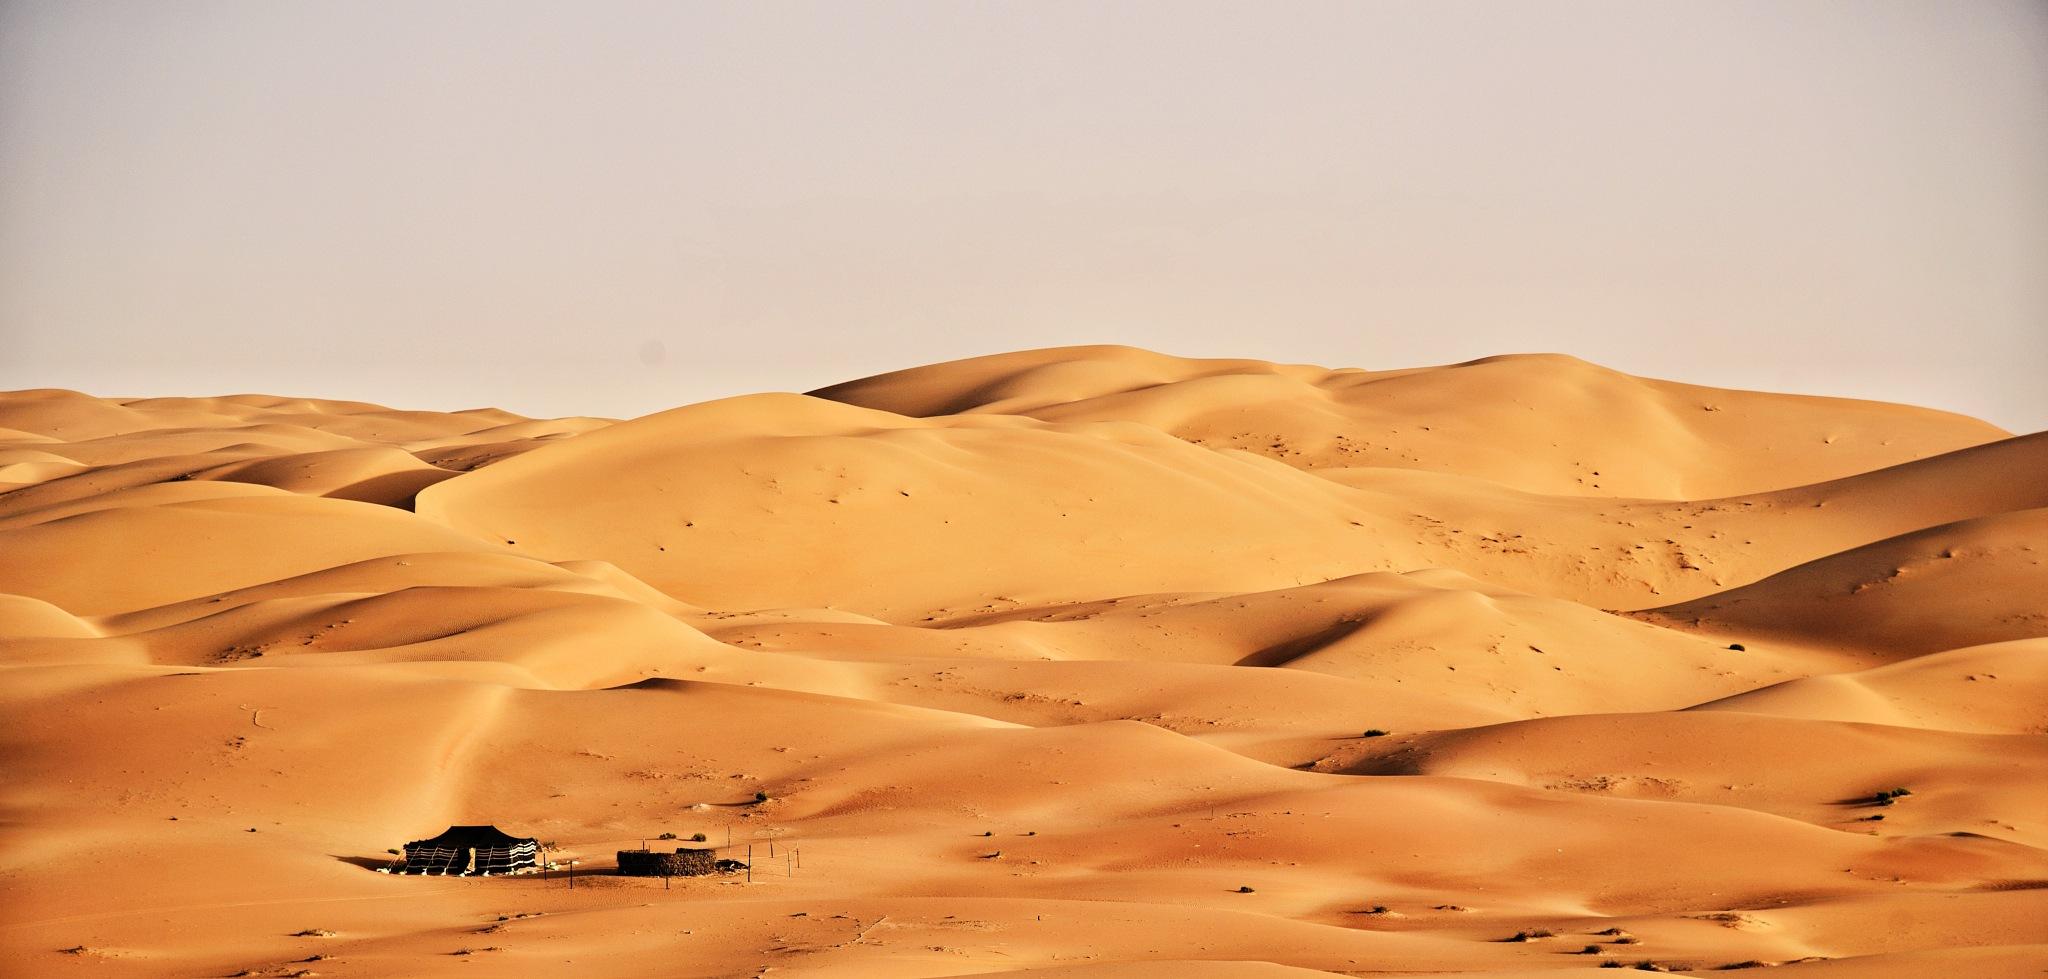 Desert-ed by Sanjiban Ghosh